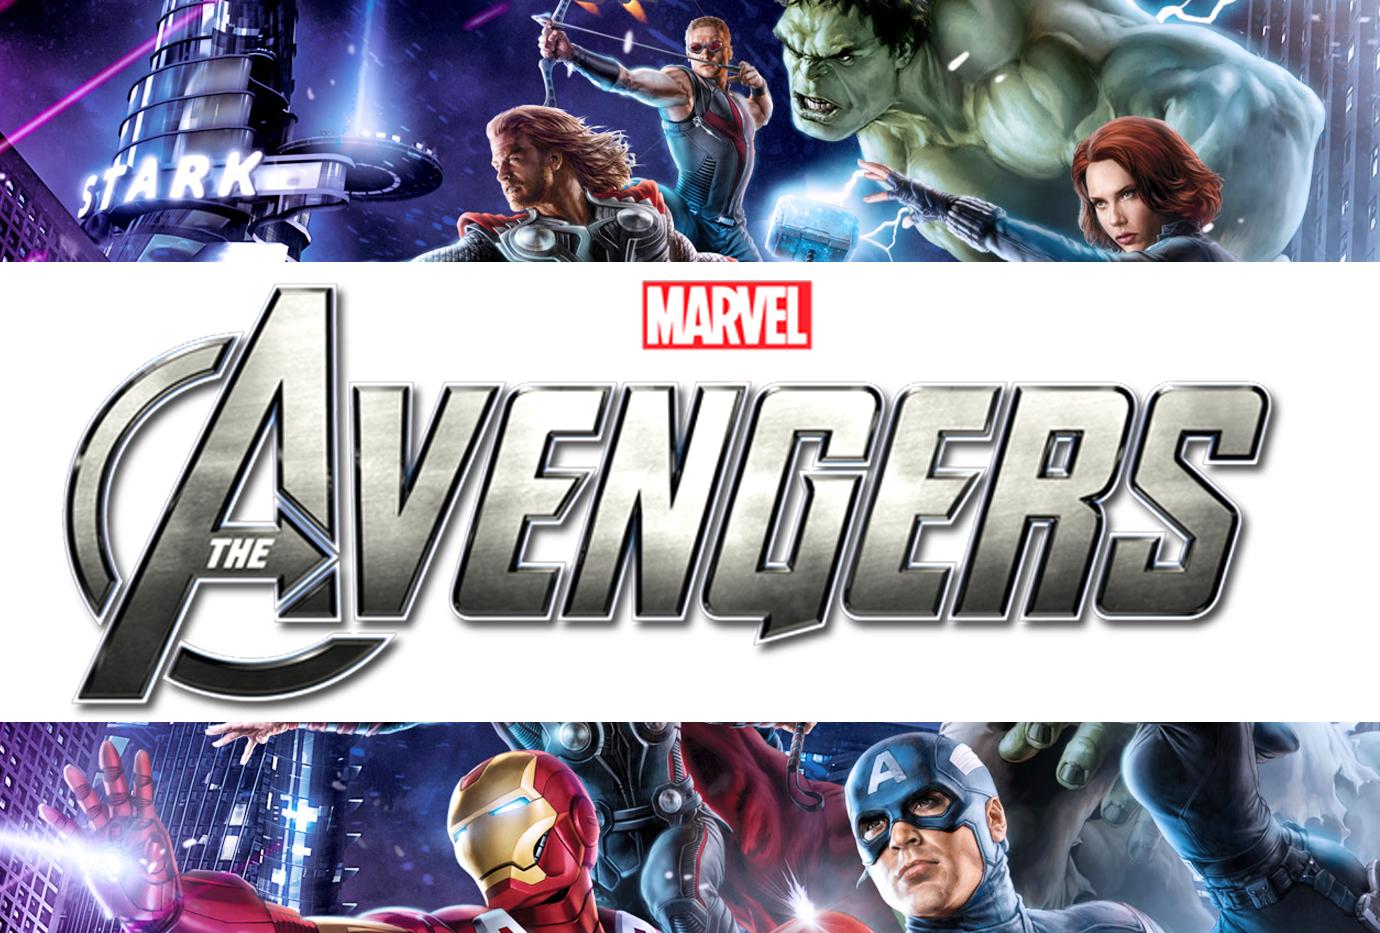 marvel_avengers-series_ls-01.png